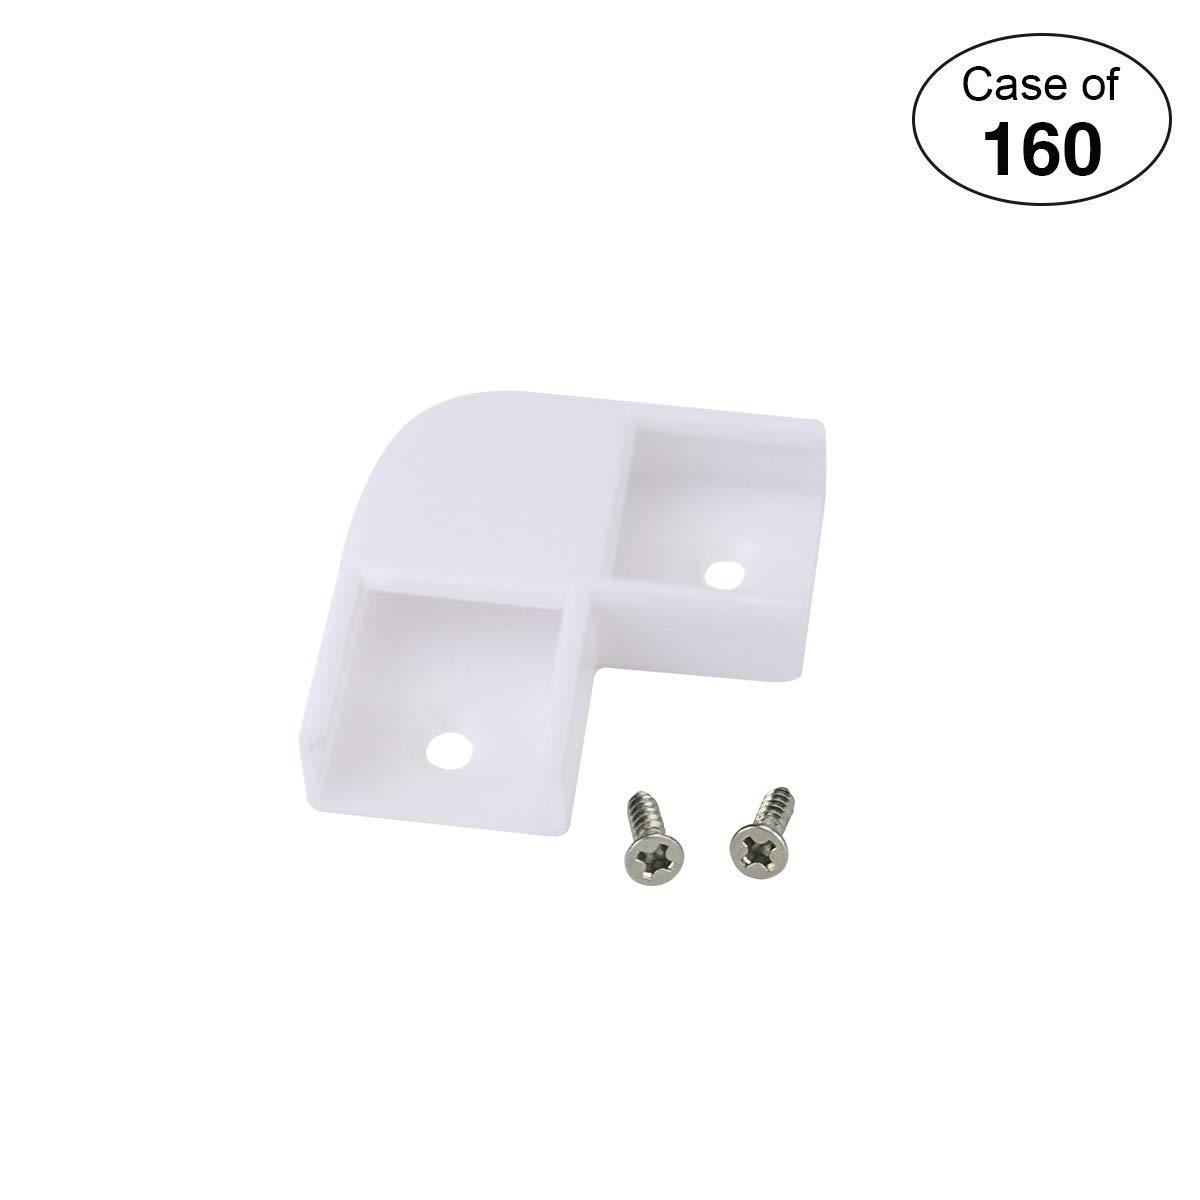 Muzata Led Channel Corner Connector kit L-Shape Adaptor 160PCS 90 Degree LC07,Series LA1 LC1 Case of 160